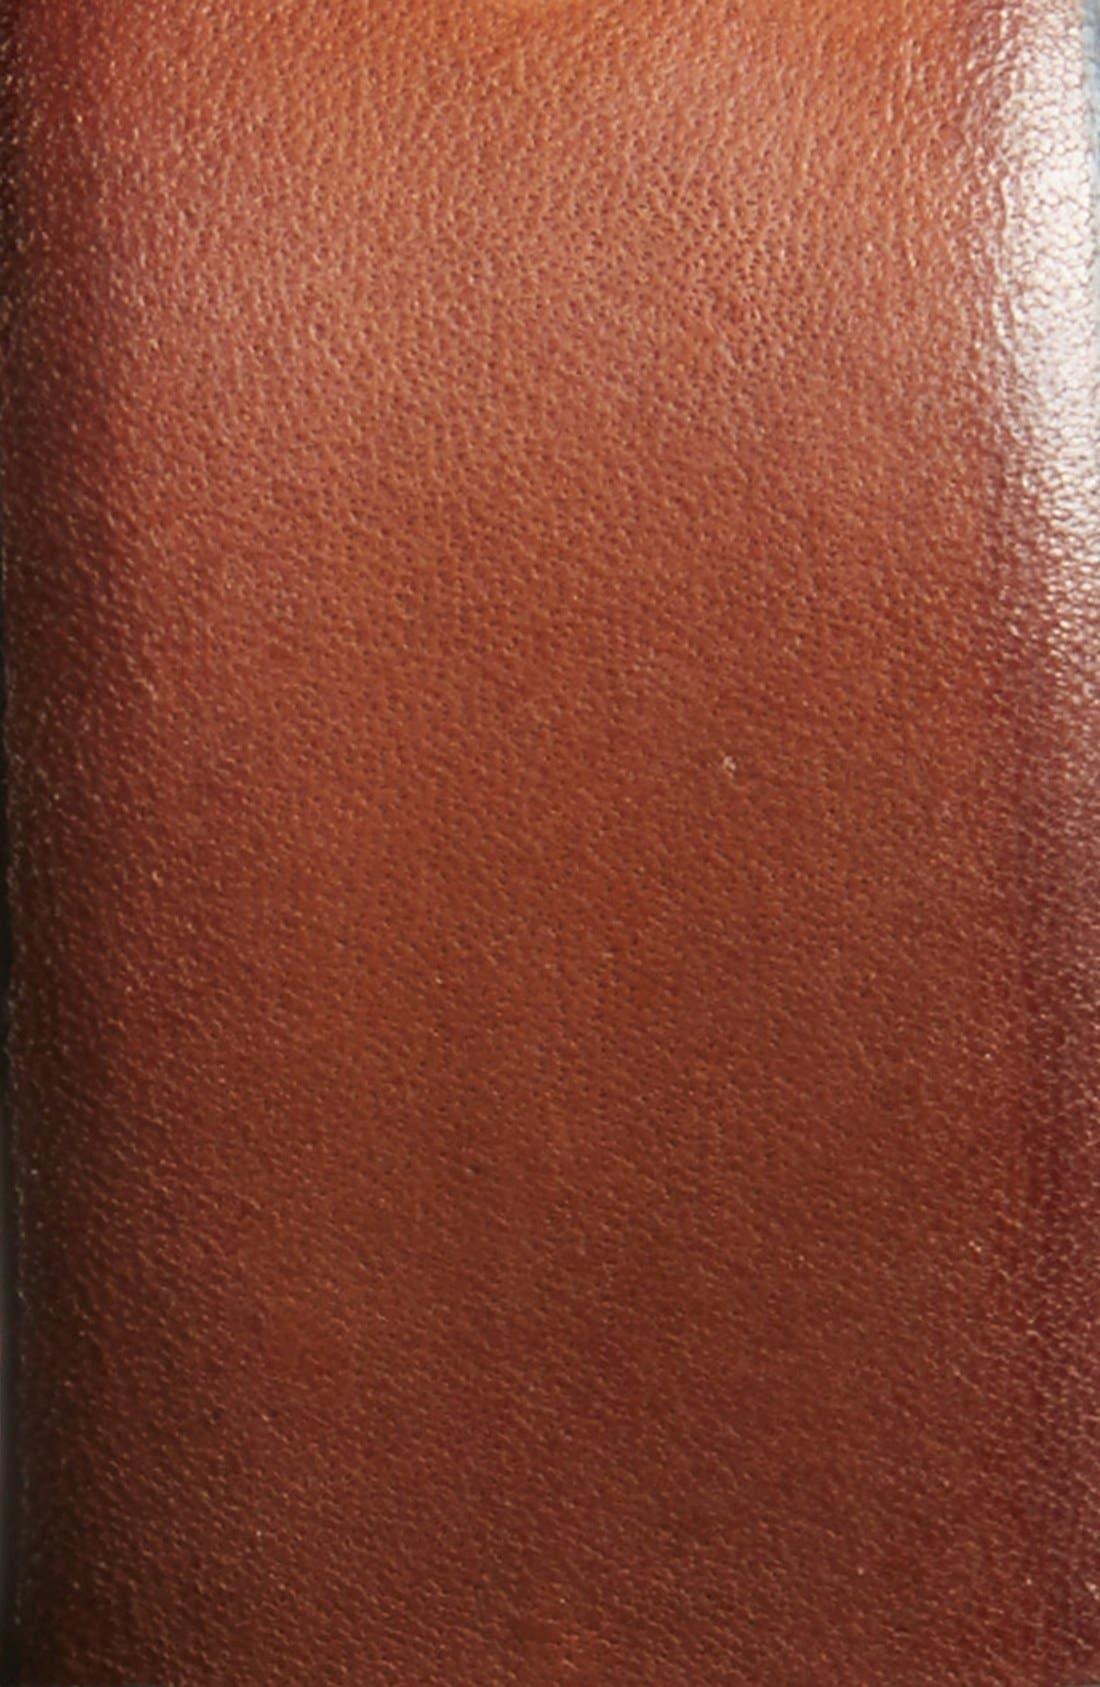 COLE HAAN, Leather Belt, Alternate thumbnail 2, color, BRITISH TAN